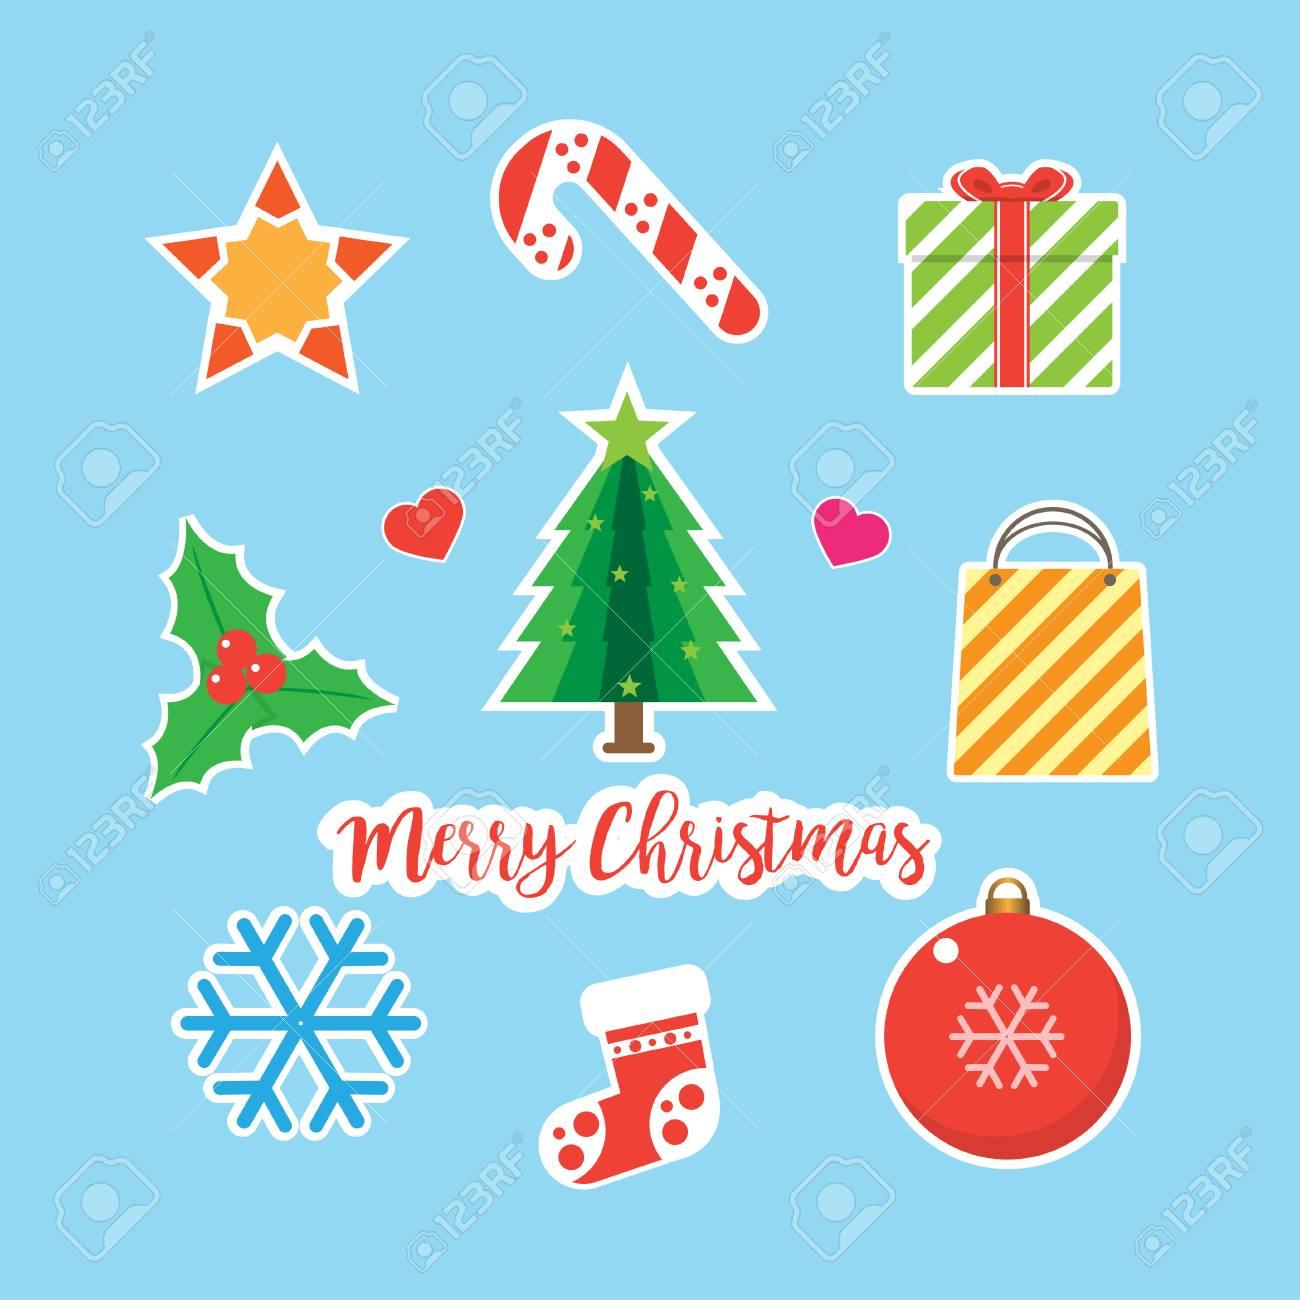 Christmas Ornaments Vector.Merry Christmas Ornaments Vector Illustration